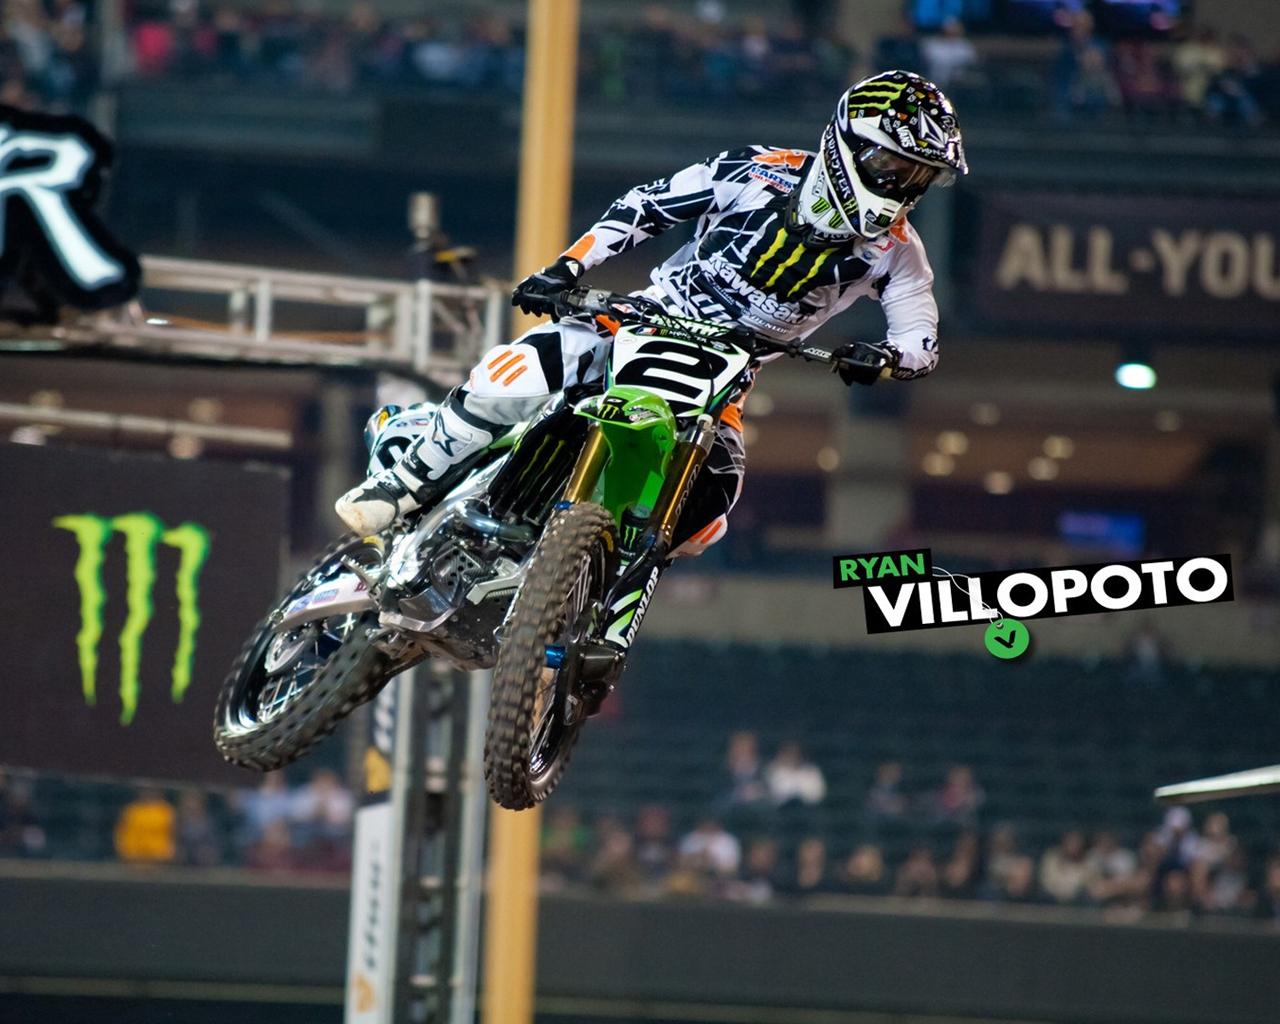 Ryan Villopoto 1280x1024